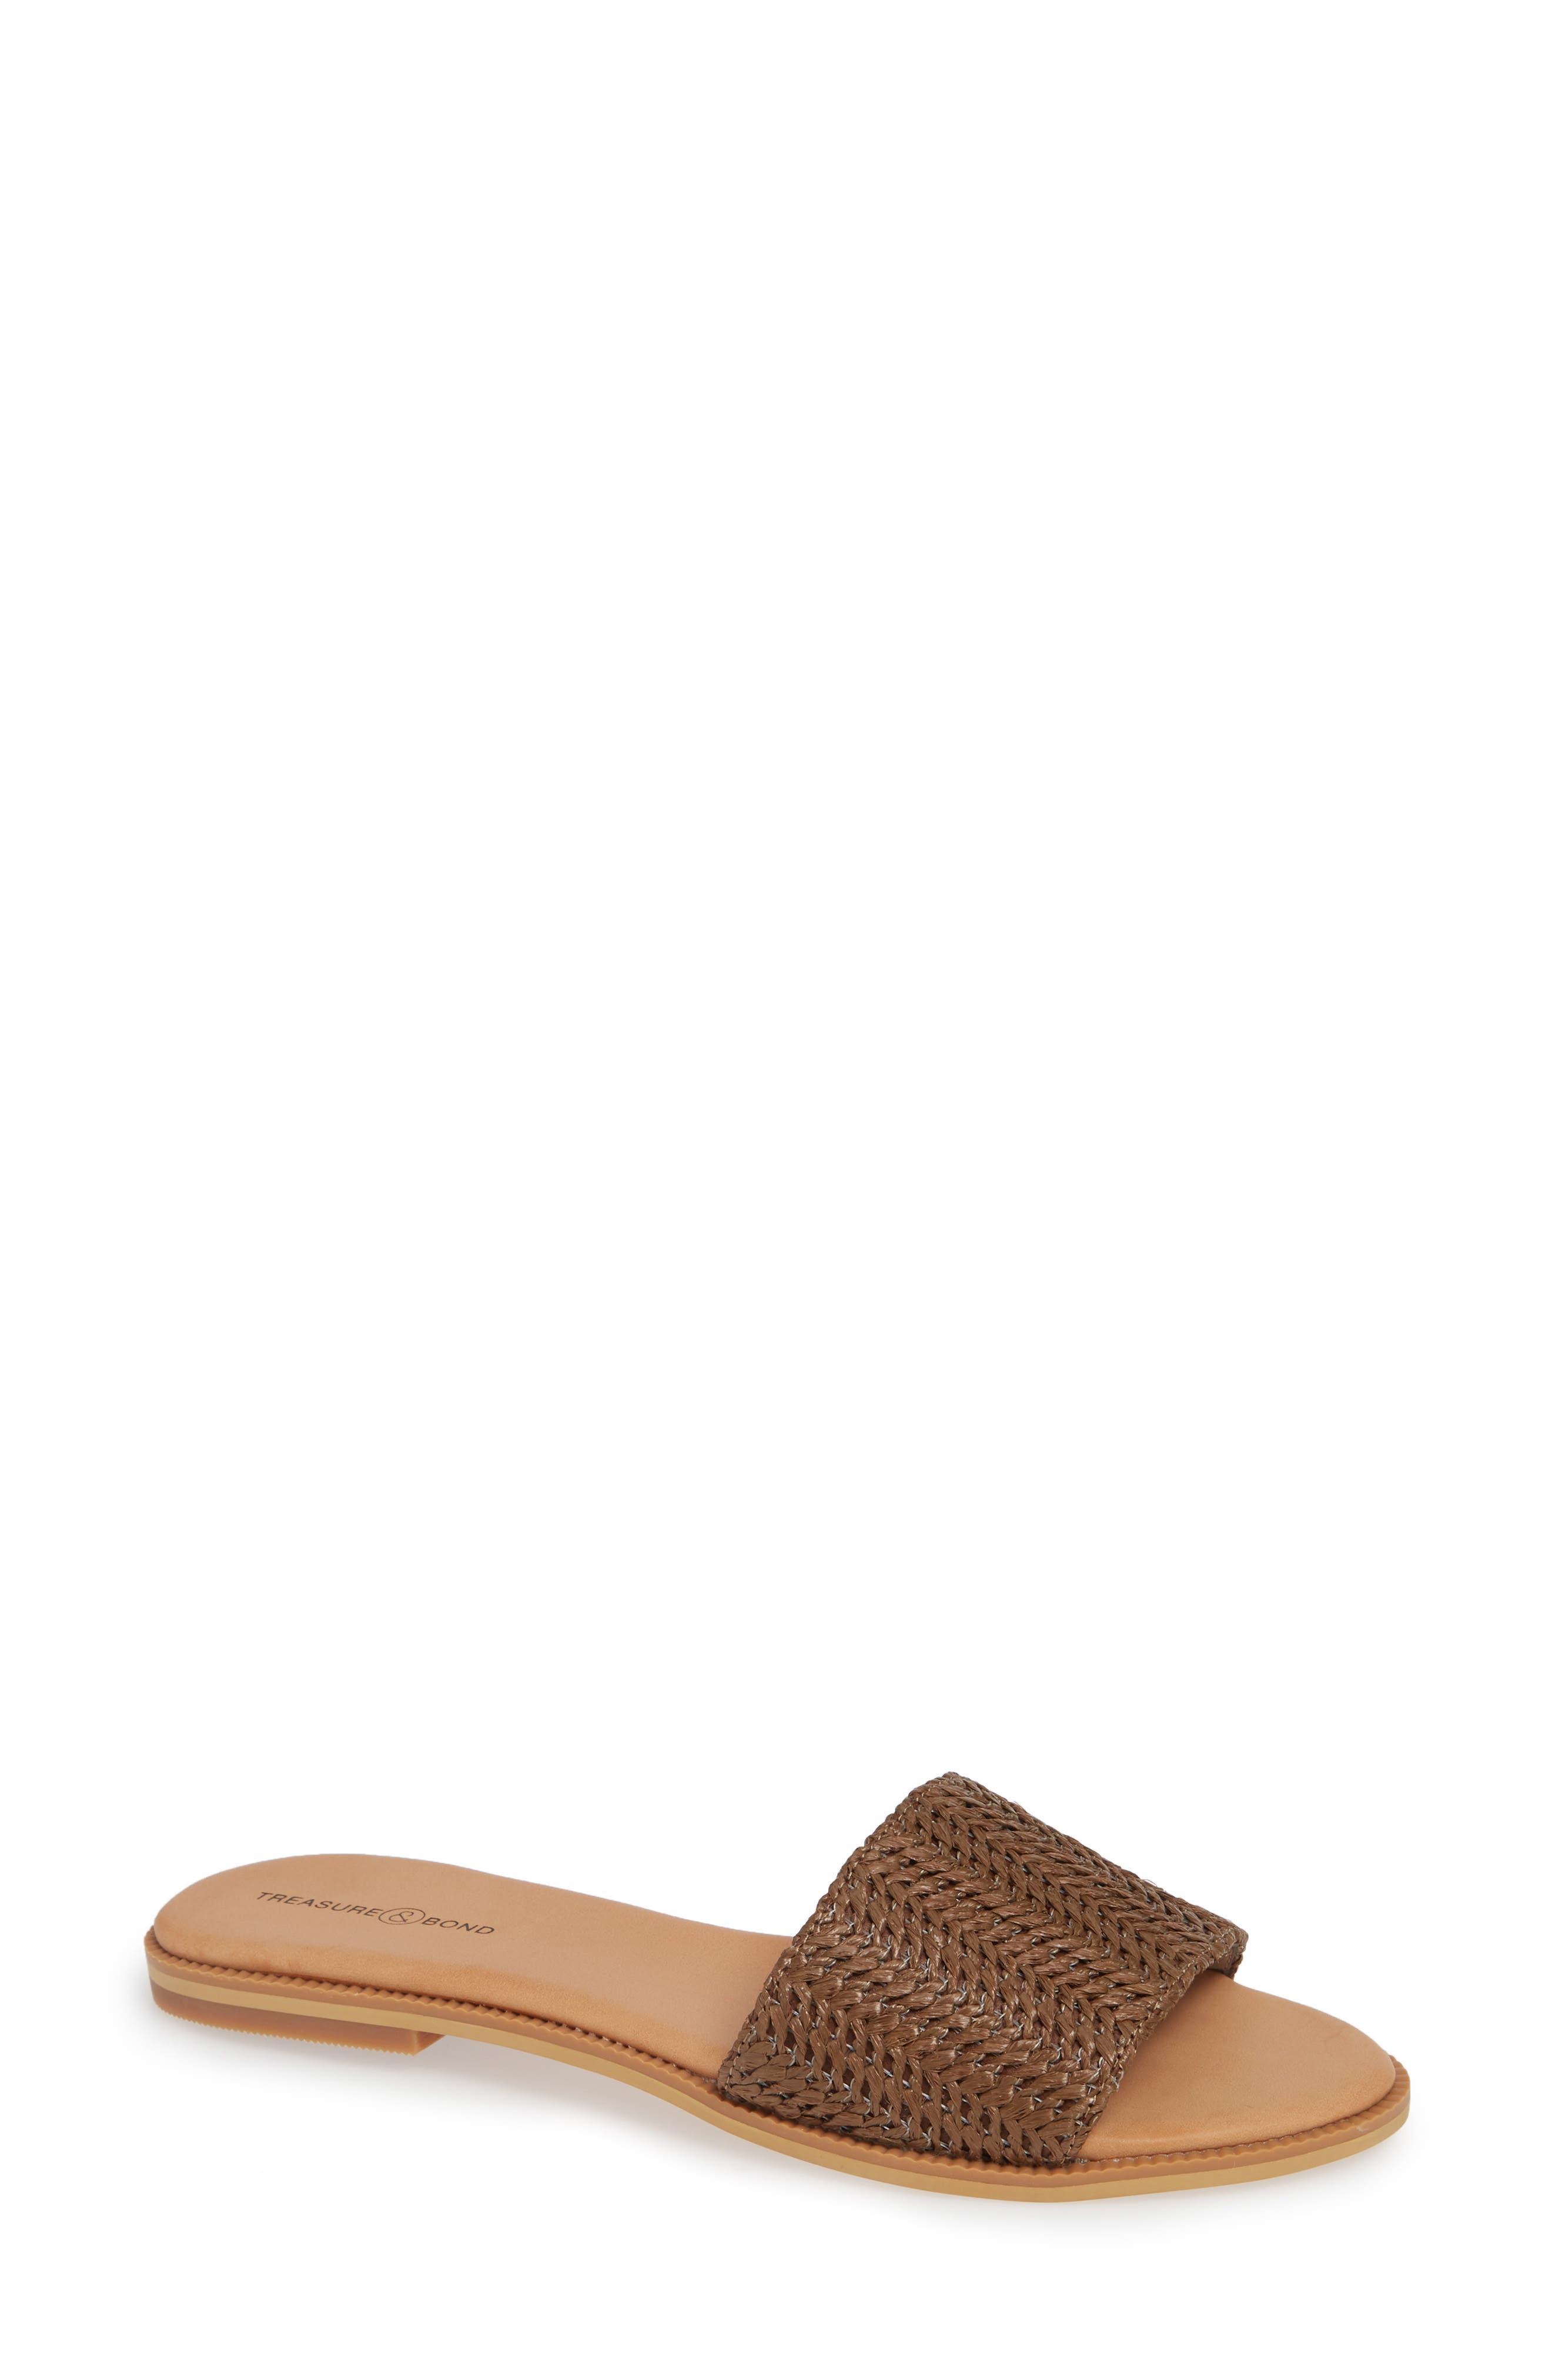 Mere Flat Slide Sandal,                         Main,                         color, BROWN FAUX RAFFIA